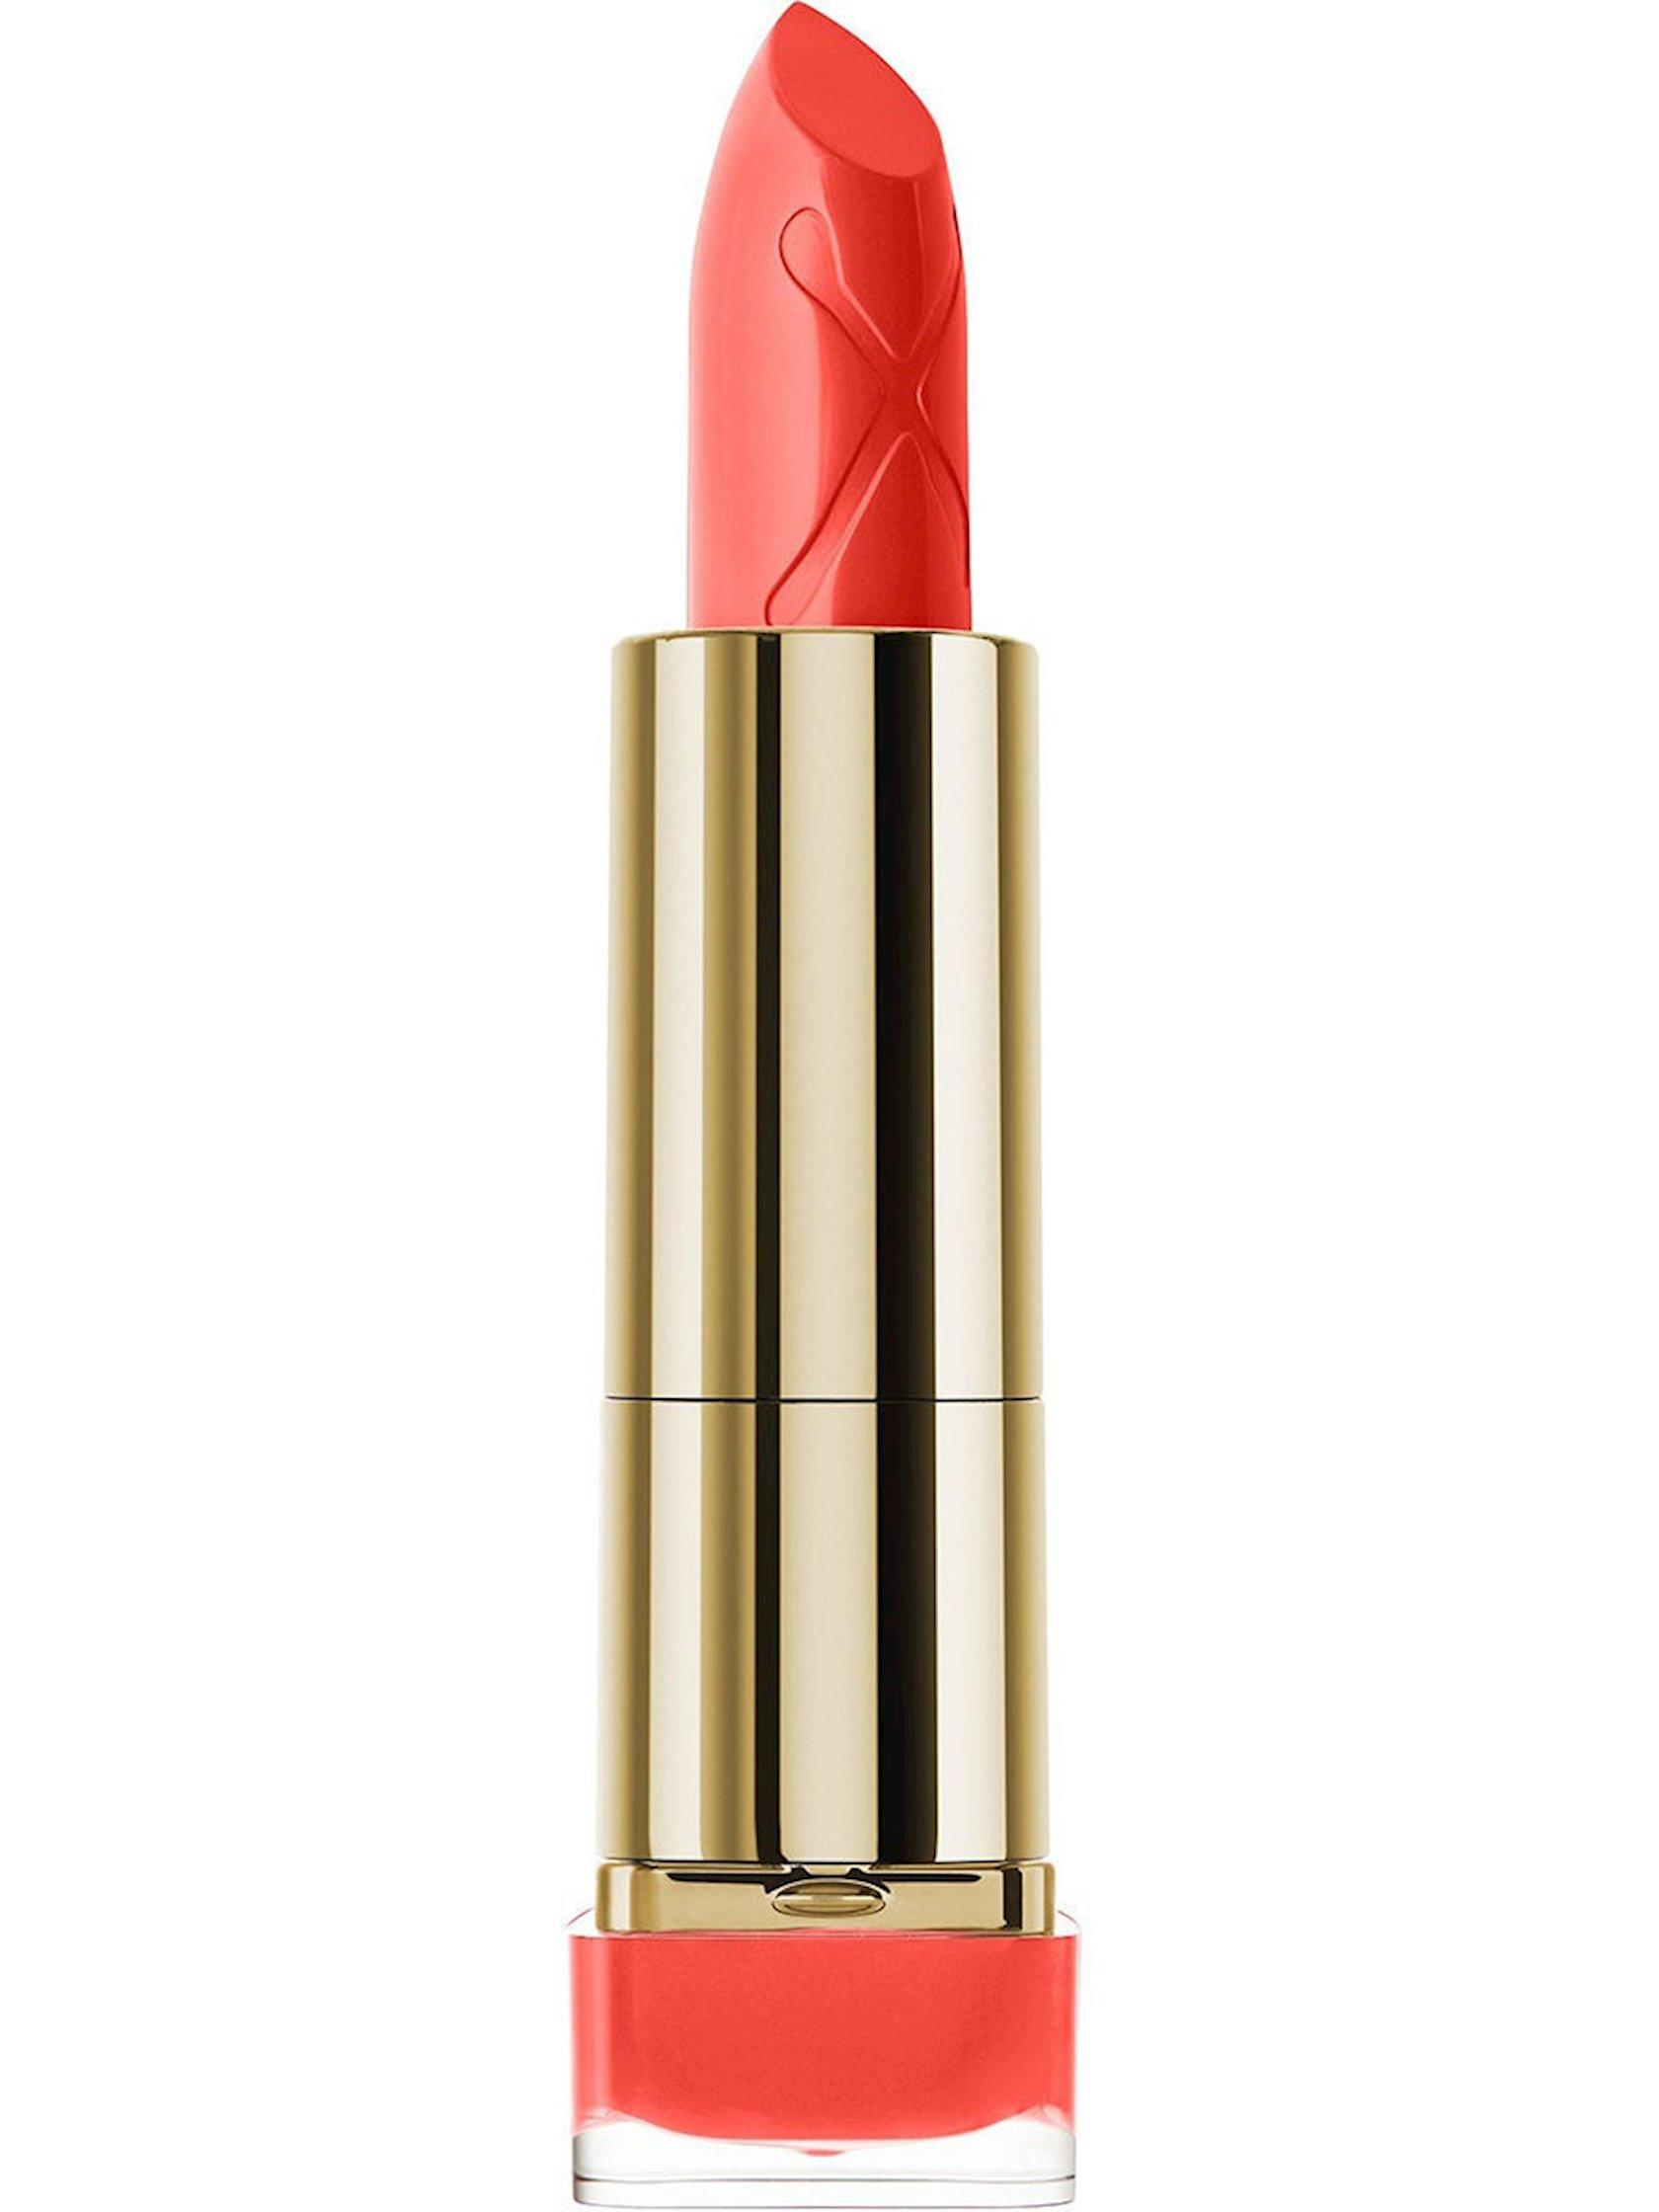 Dodaq pomadası Max Factor Colour Elixir Lipstick 060 Intensely Coral 4.8 q